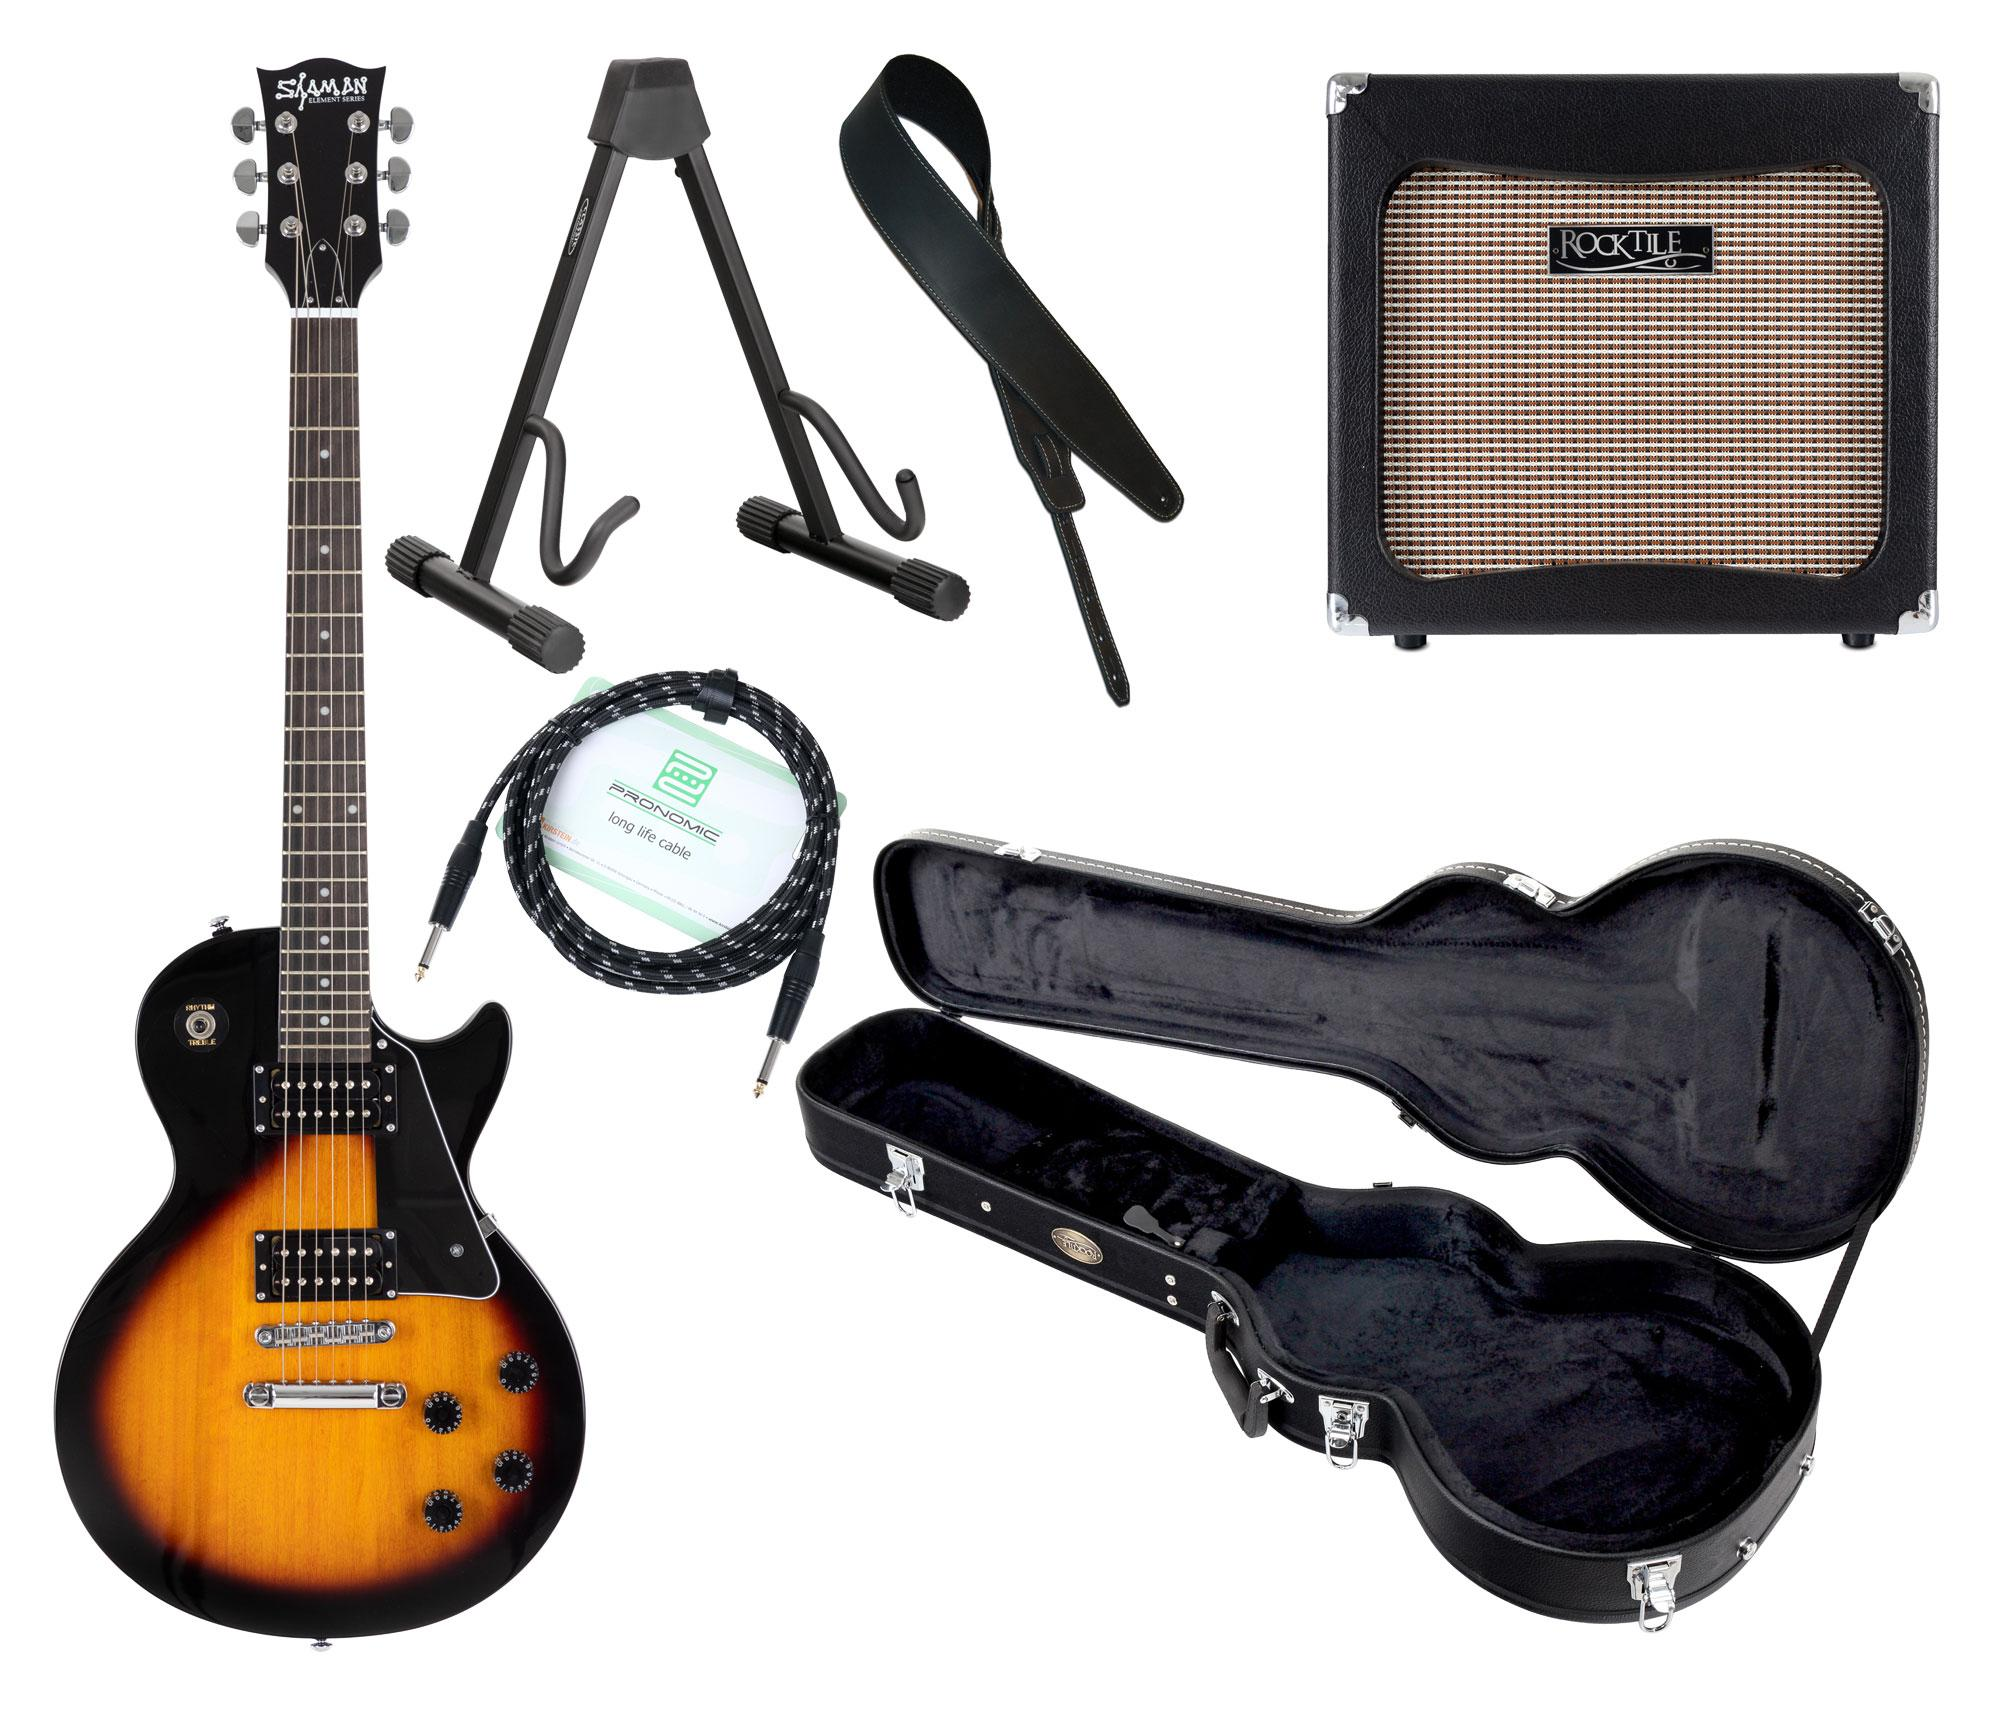 Egitarren - Shaman Element Series SCX 100VS Komplett Set - Onlineshop Musikhaus Kirstein